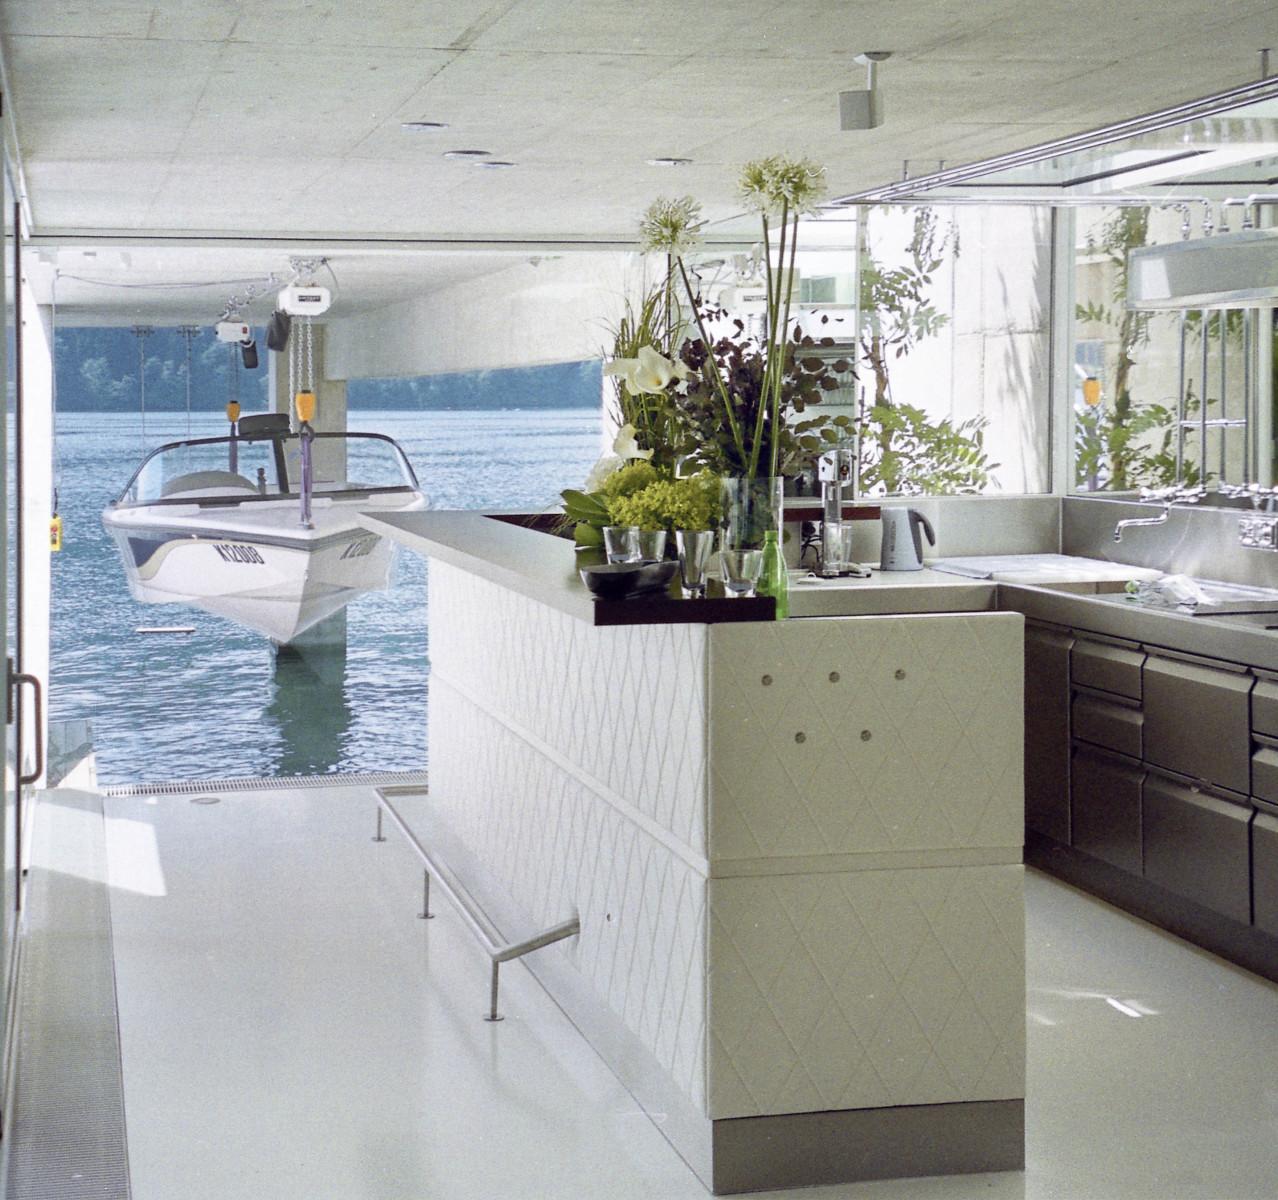 architektur am wasser callwey blog. Black Bedroom Furniture Sets. Home Design Ideas